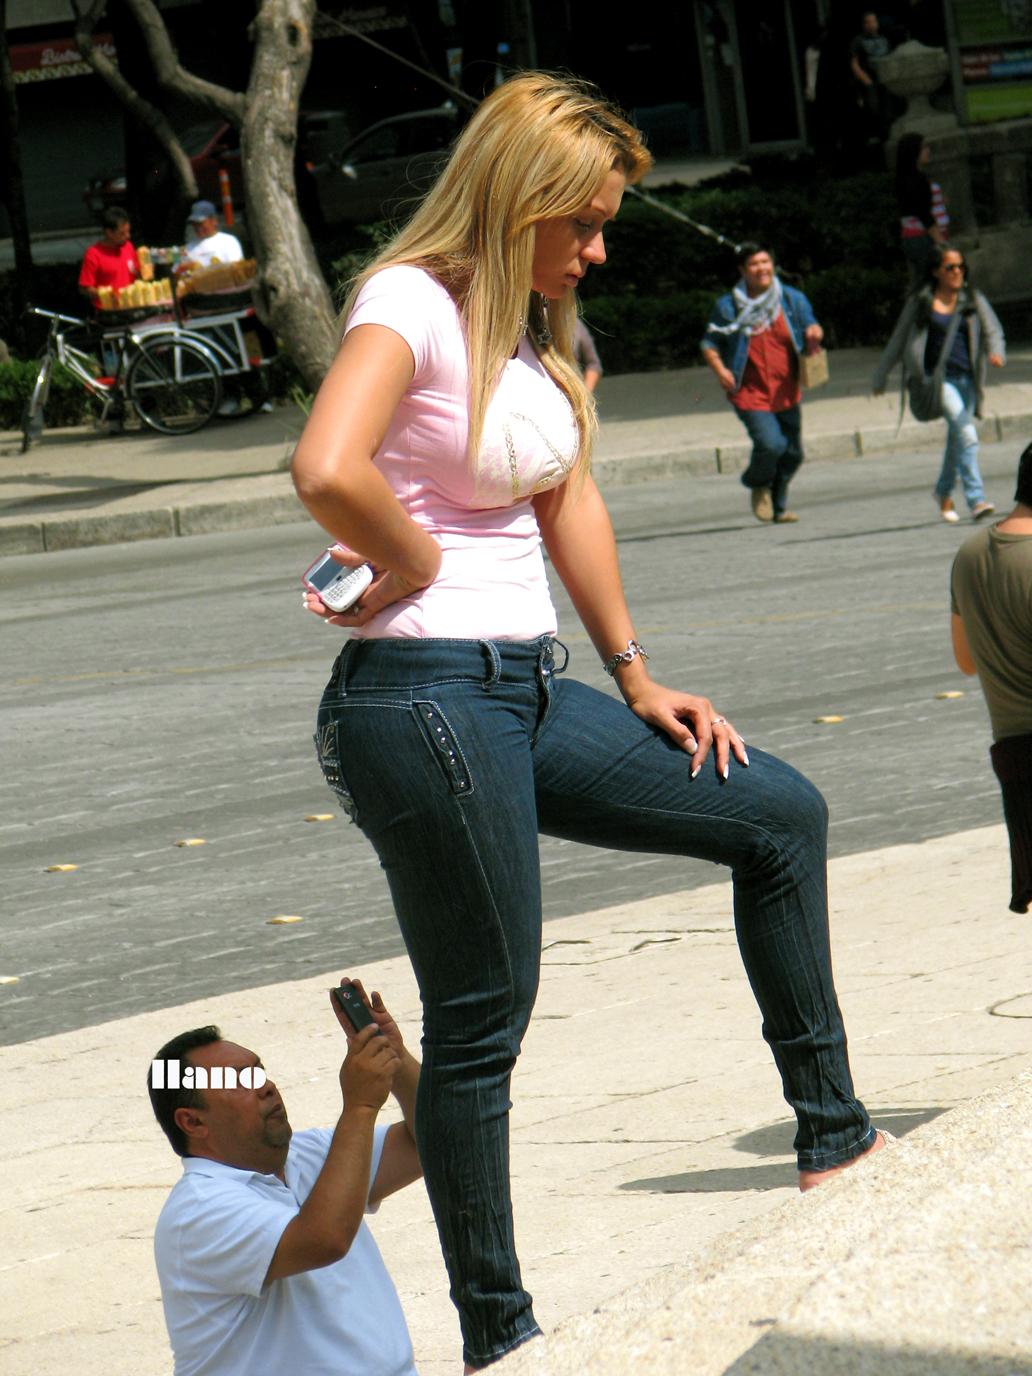 Street milf in blue pants